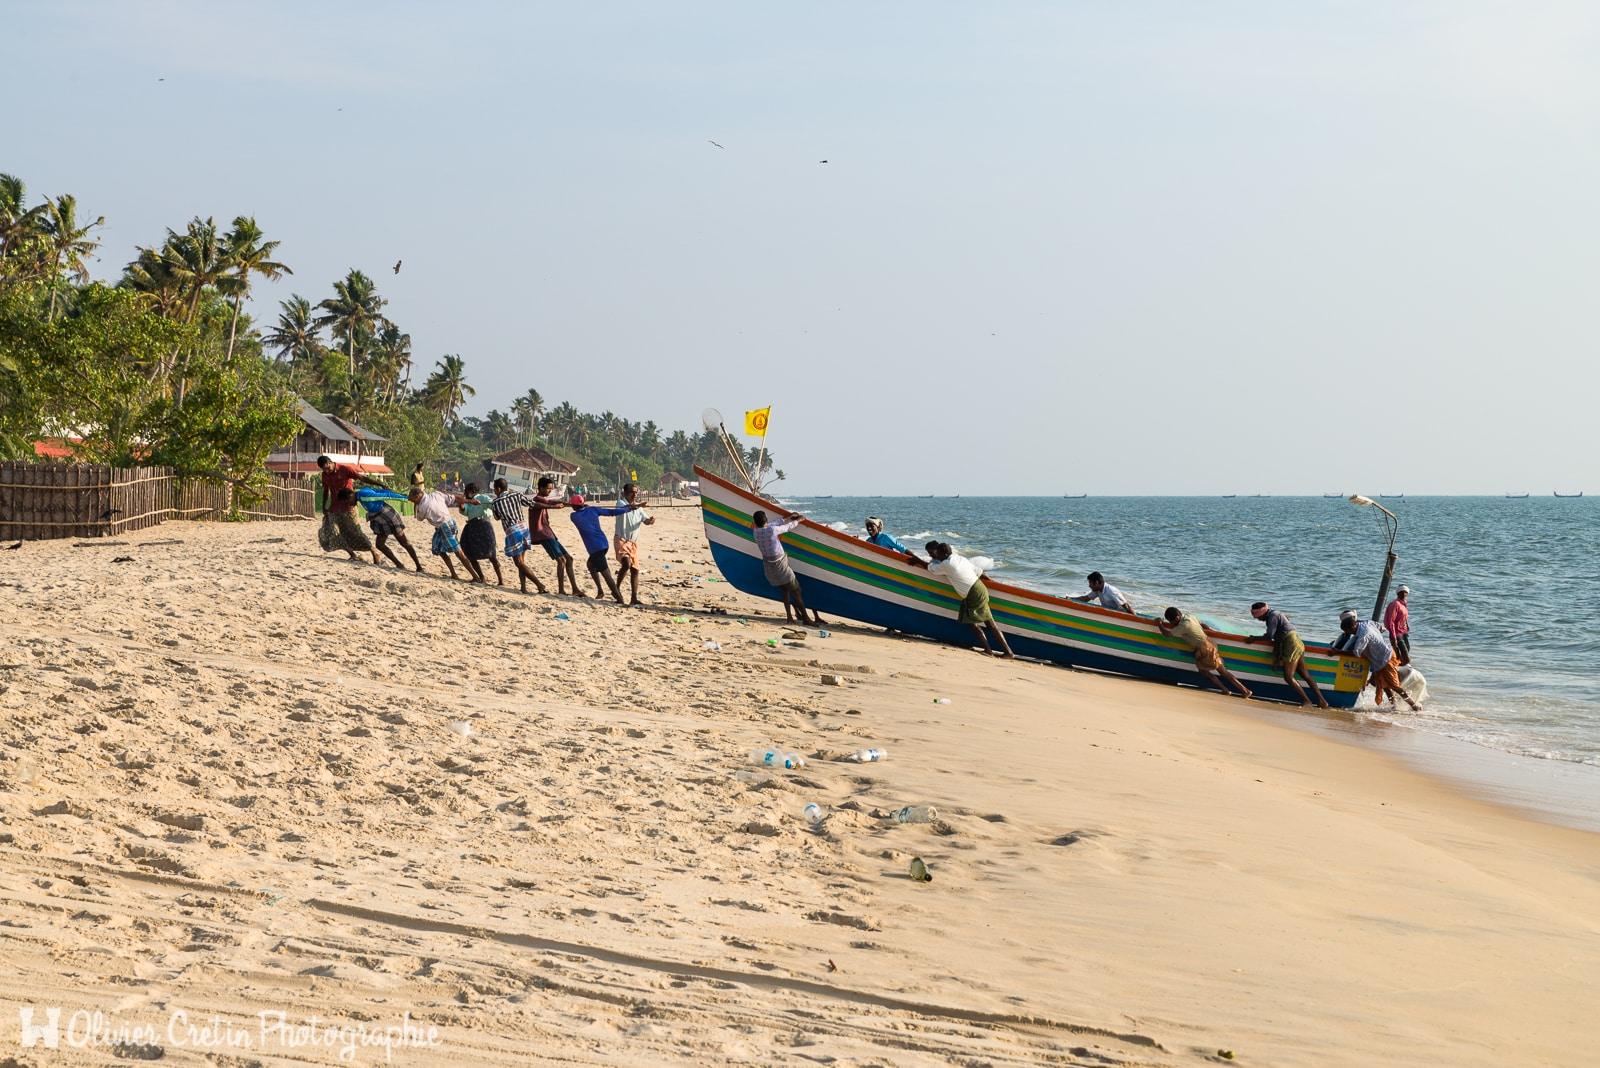 Inde - Le retour de la pêche à Marari beach